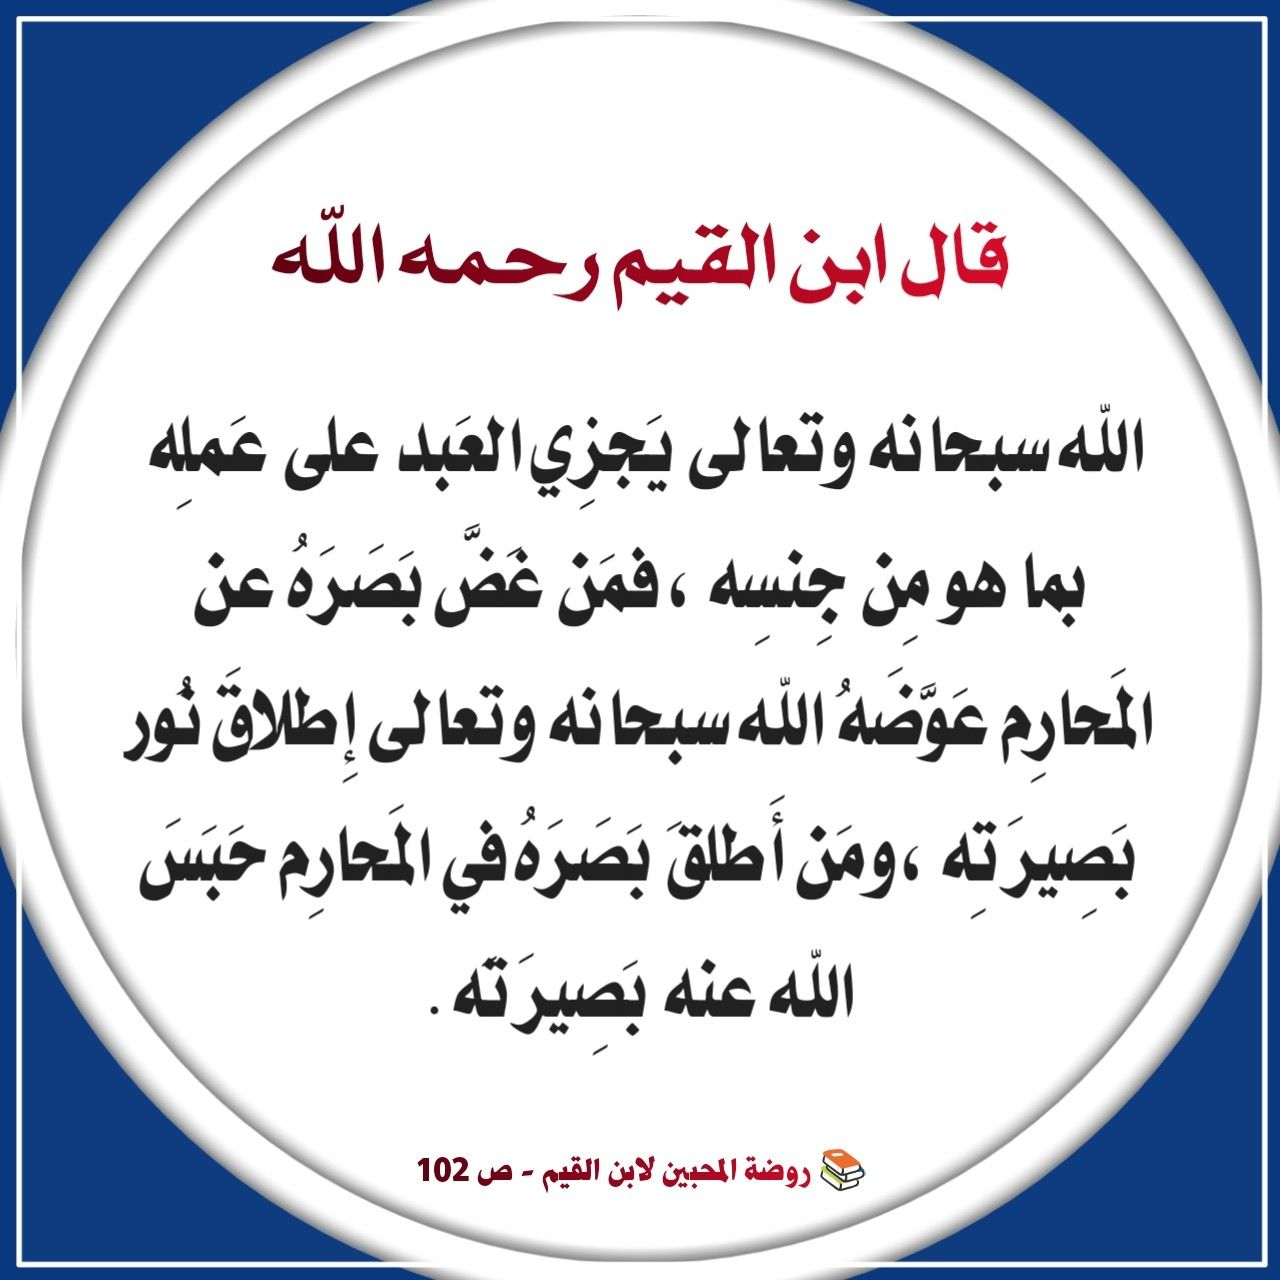 Pin By أدعية وأذكار Adiyaa W Azkar On بطاقات العلم الشرعي وفتاوى العلماء Words Quotes Salaah Arabic Quotes